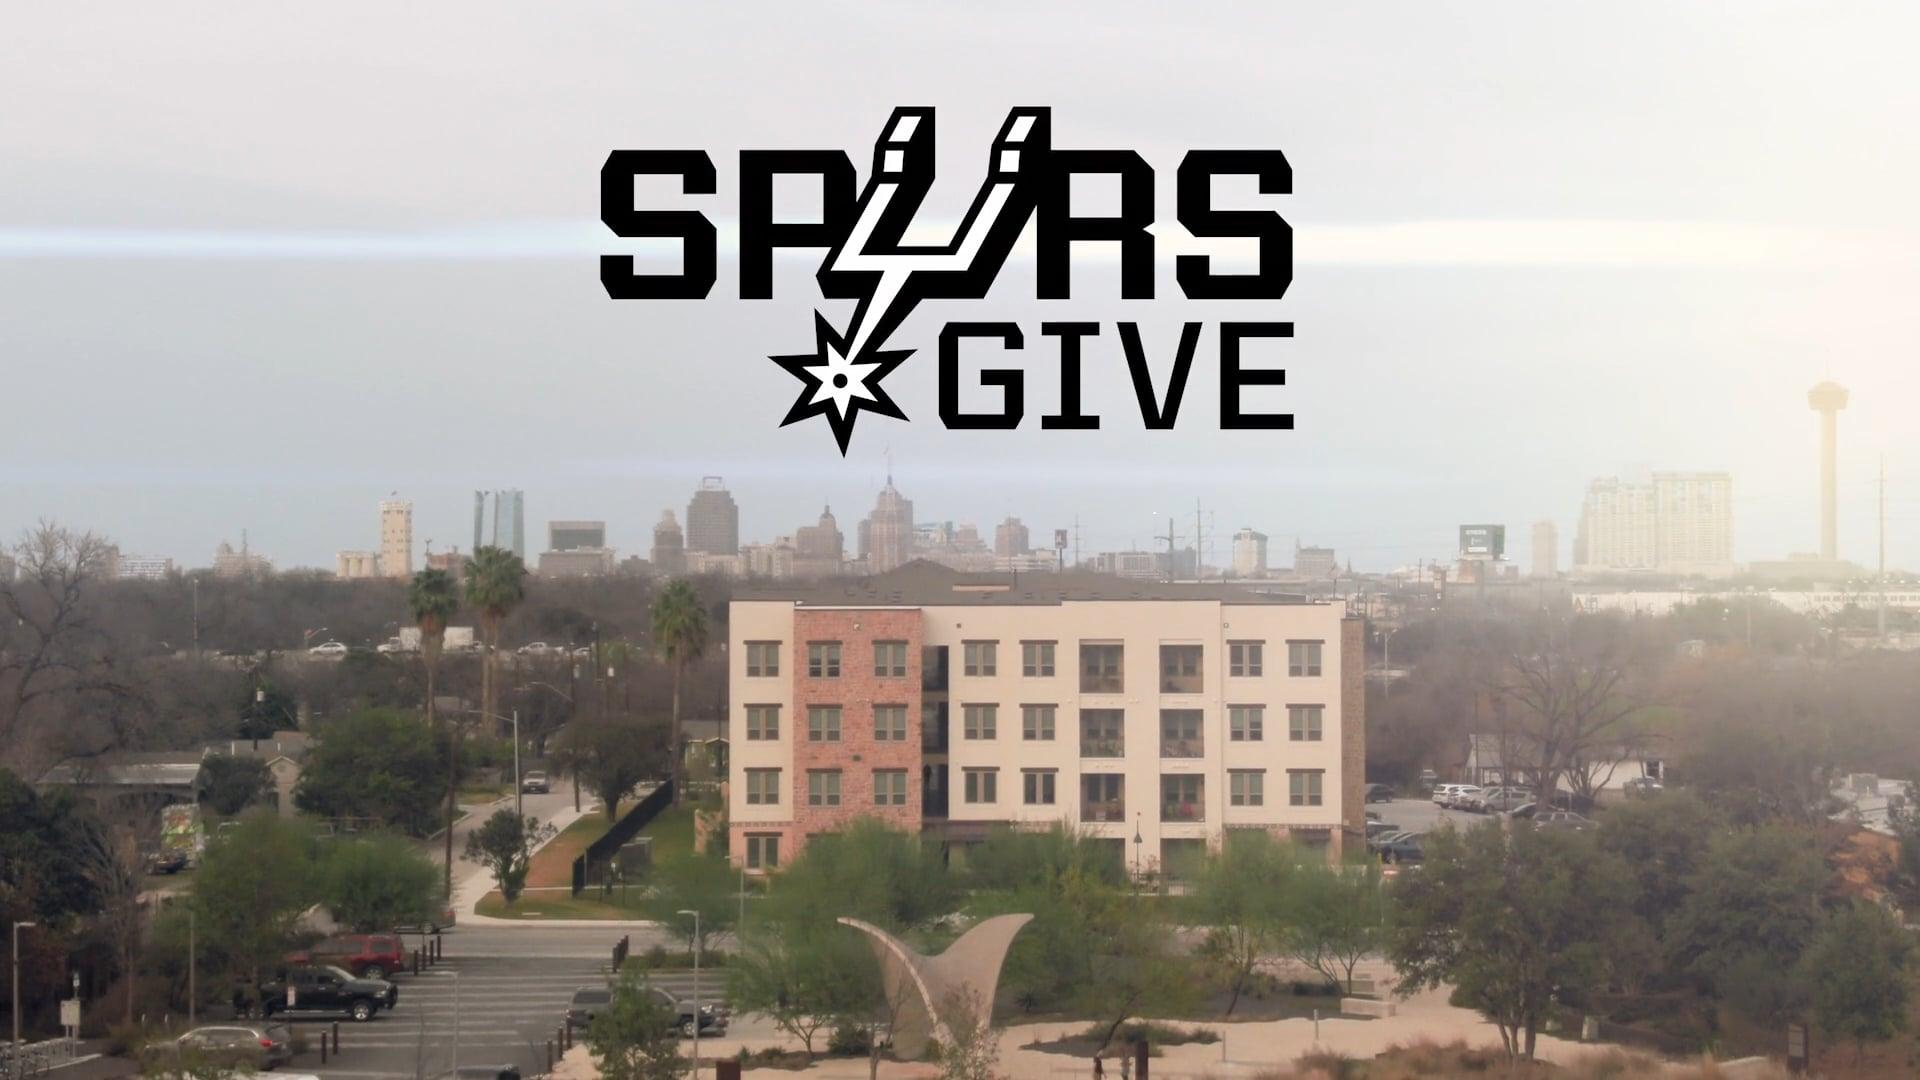 Spurs Gives